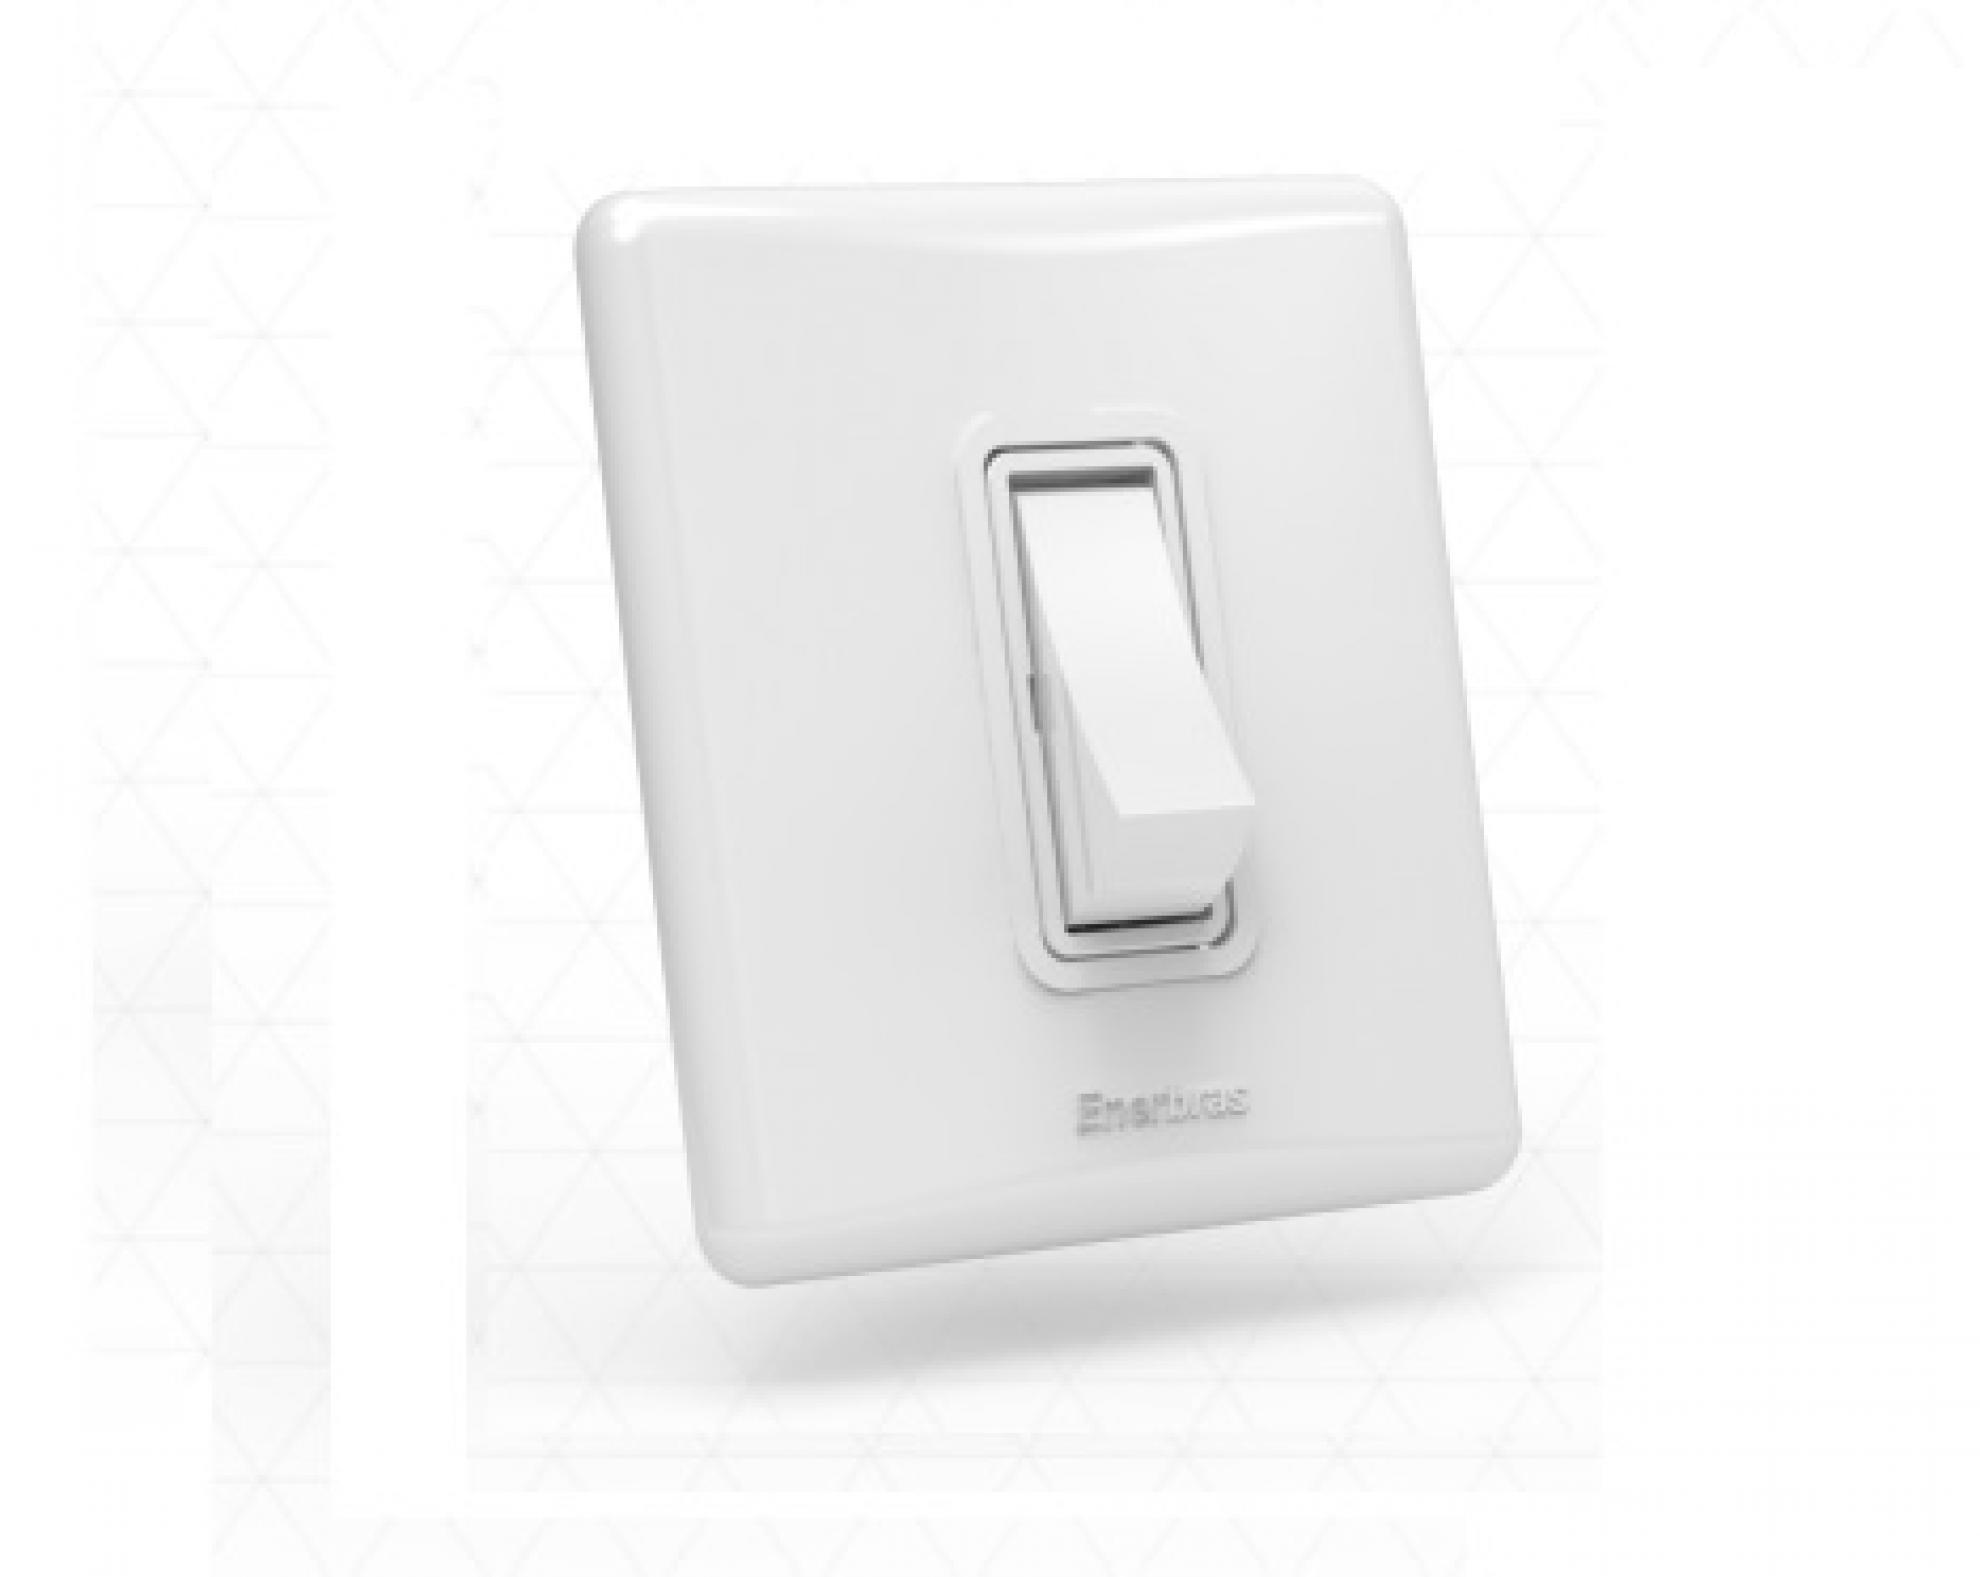 Interruptor com 1 tecla - Simples branco